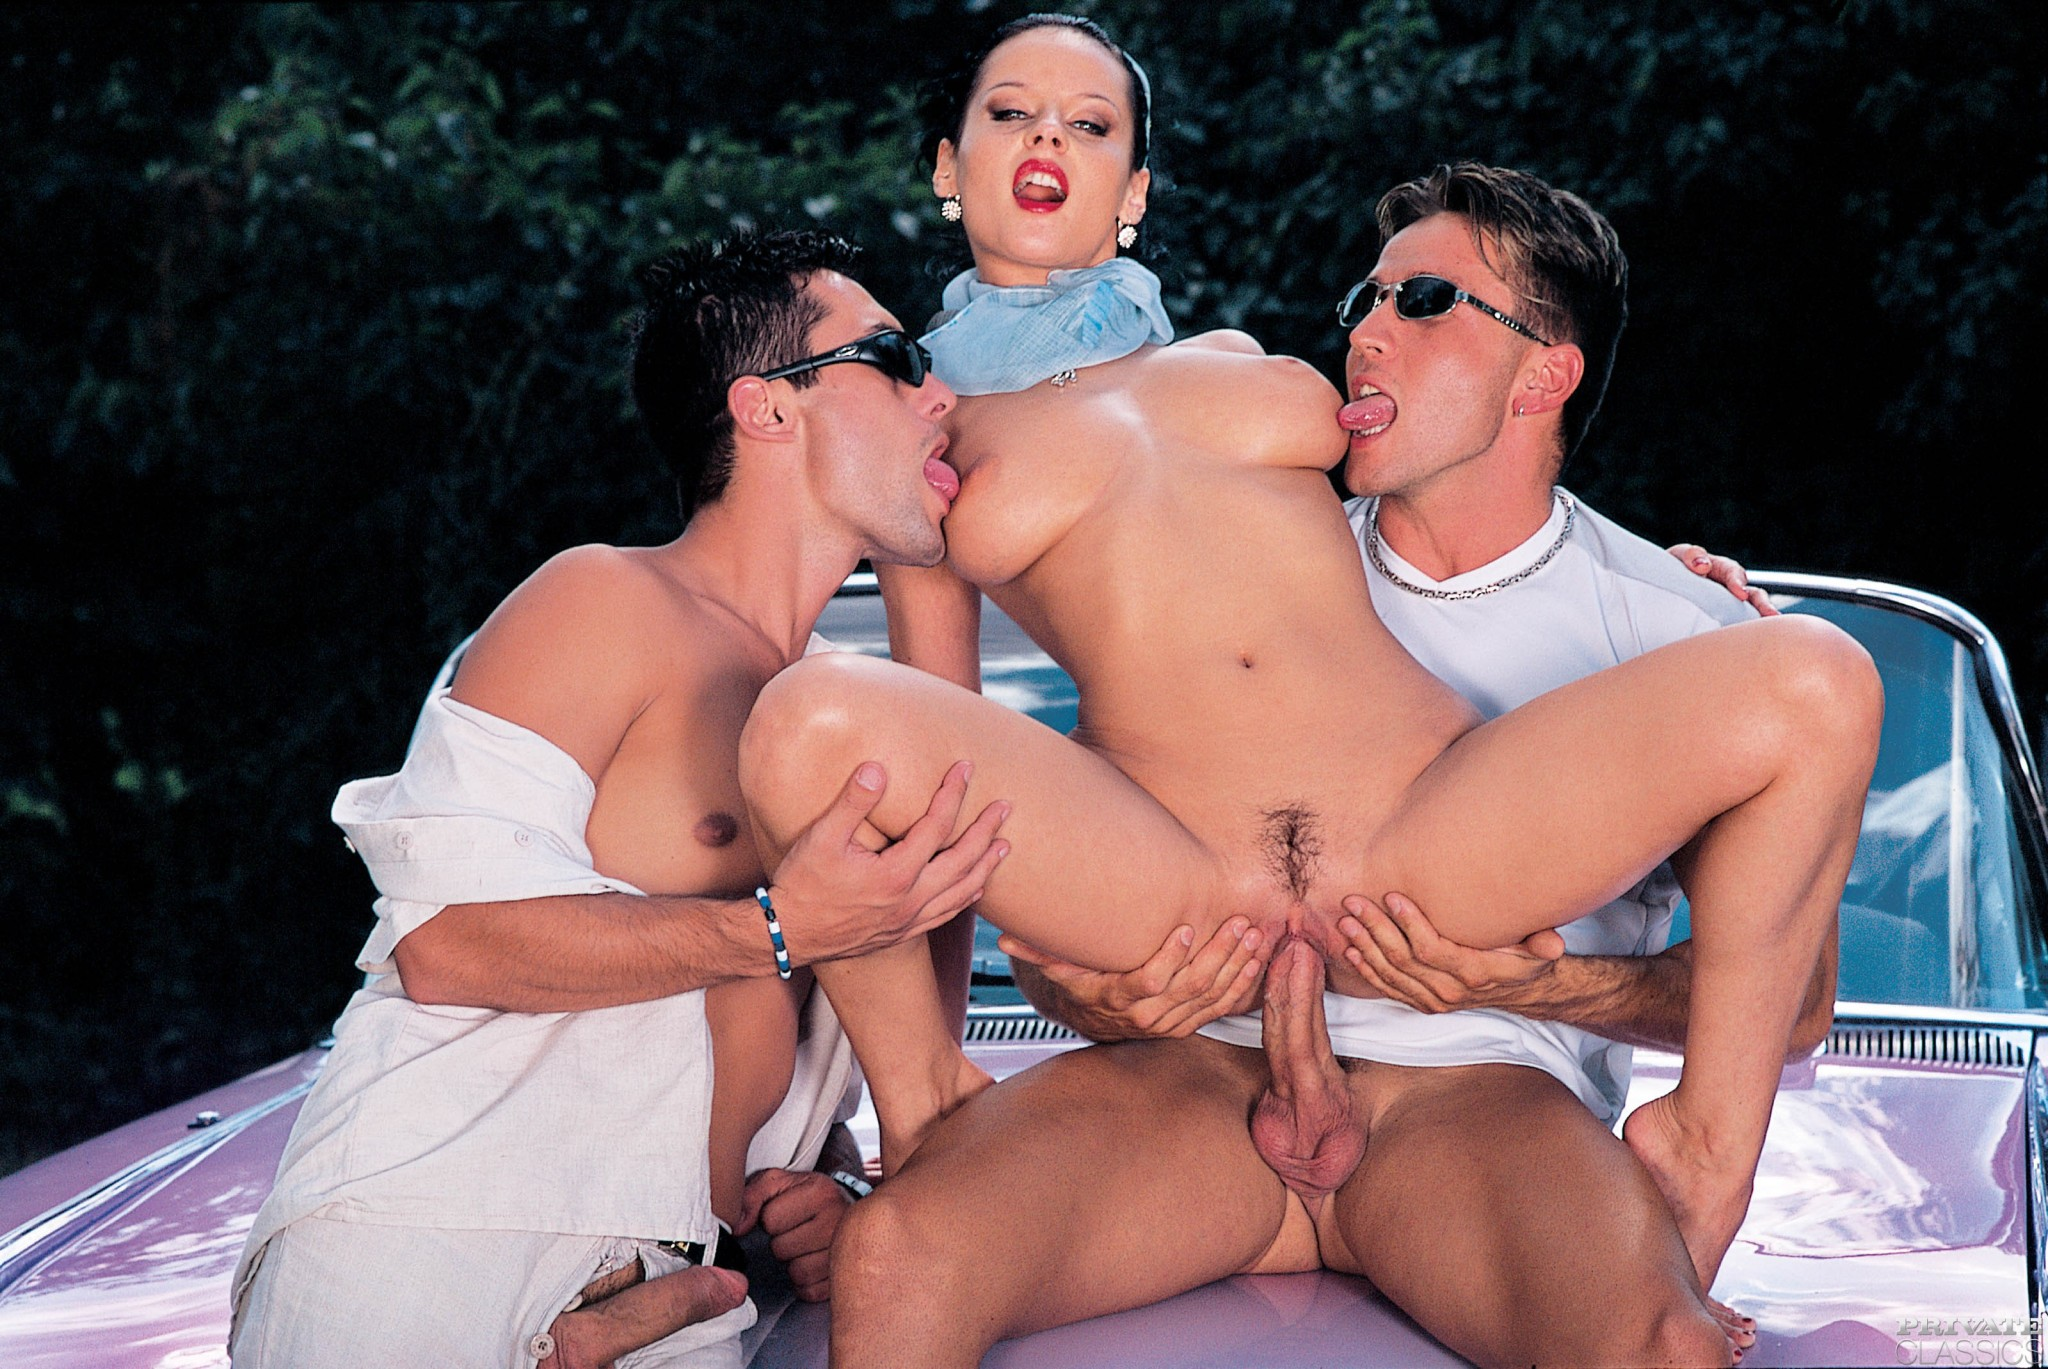 Isabella kelly wild school girls bang in class sex photo